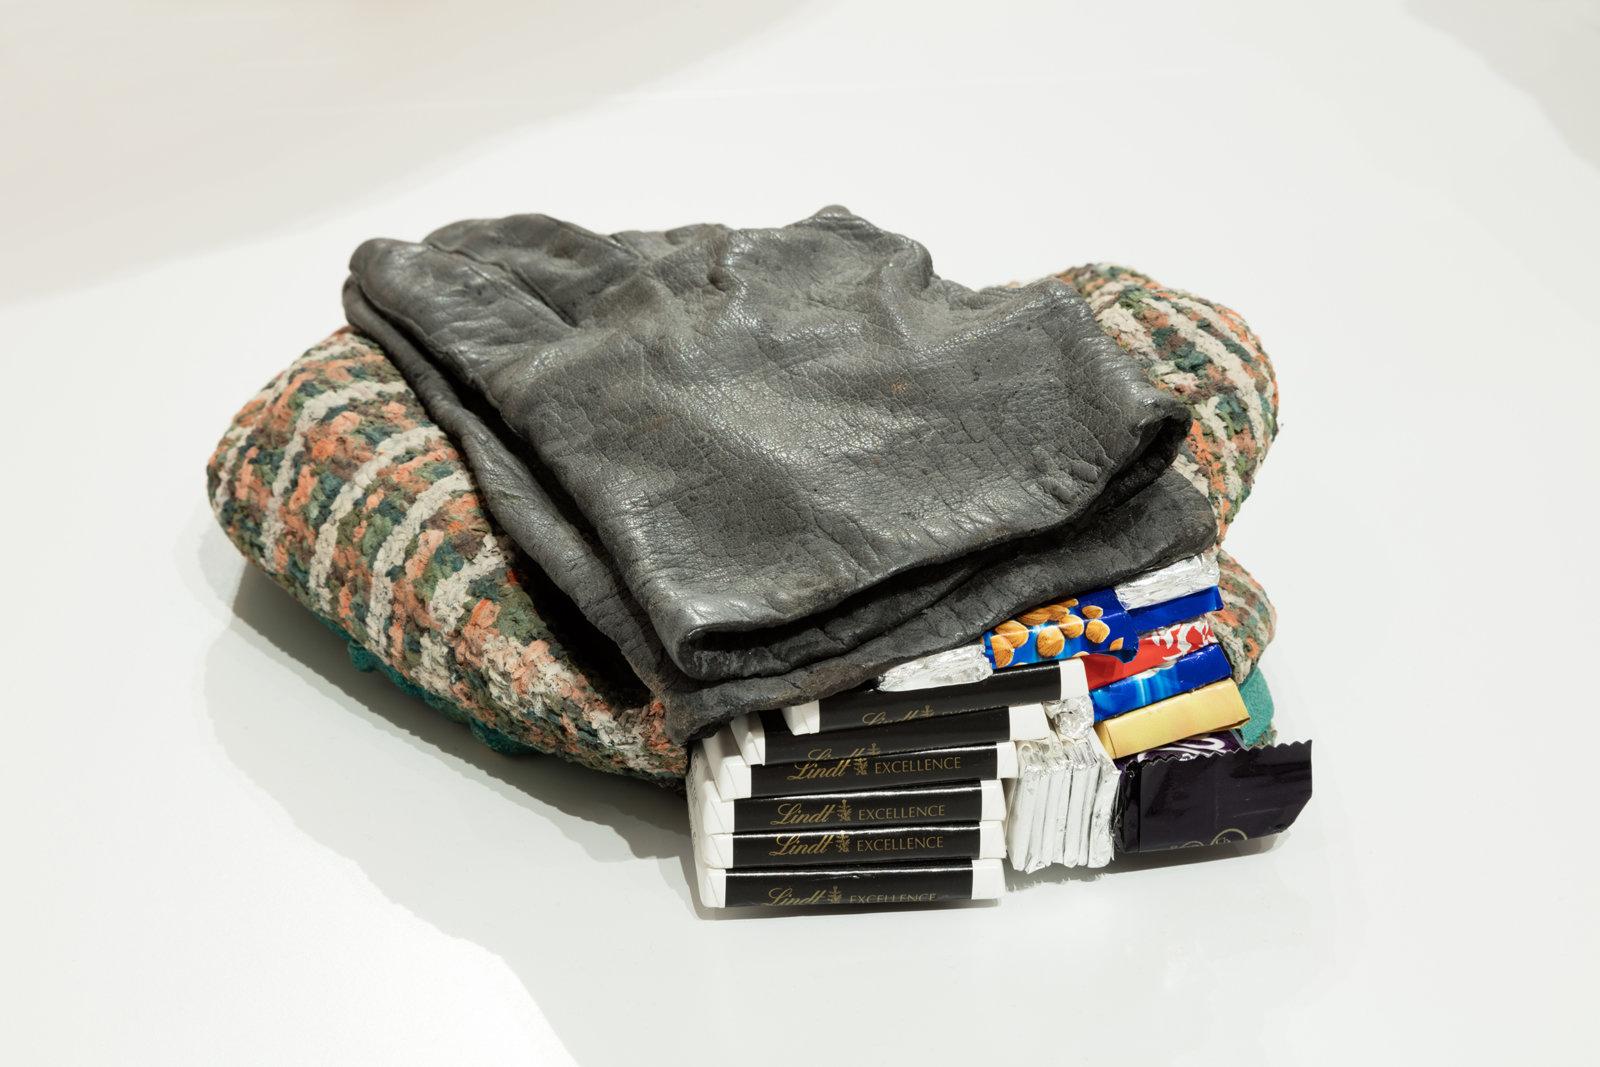 Liz Magor, Hat and Gloves, 2007, polymerized gypsum, chocolate bars, 4 x 8 x 10 in. (9 x 21 x 25 cm). Installation view, Habitude, Musée d'art contemporain de Montréal, 2016 by Liz Magor